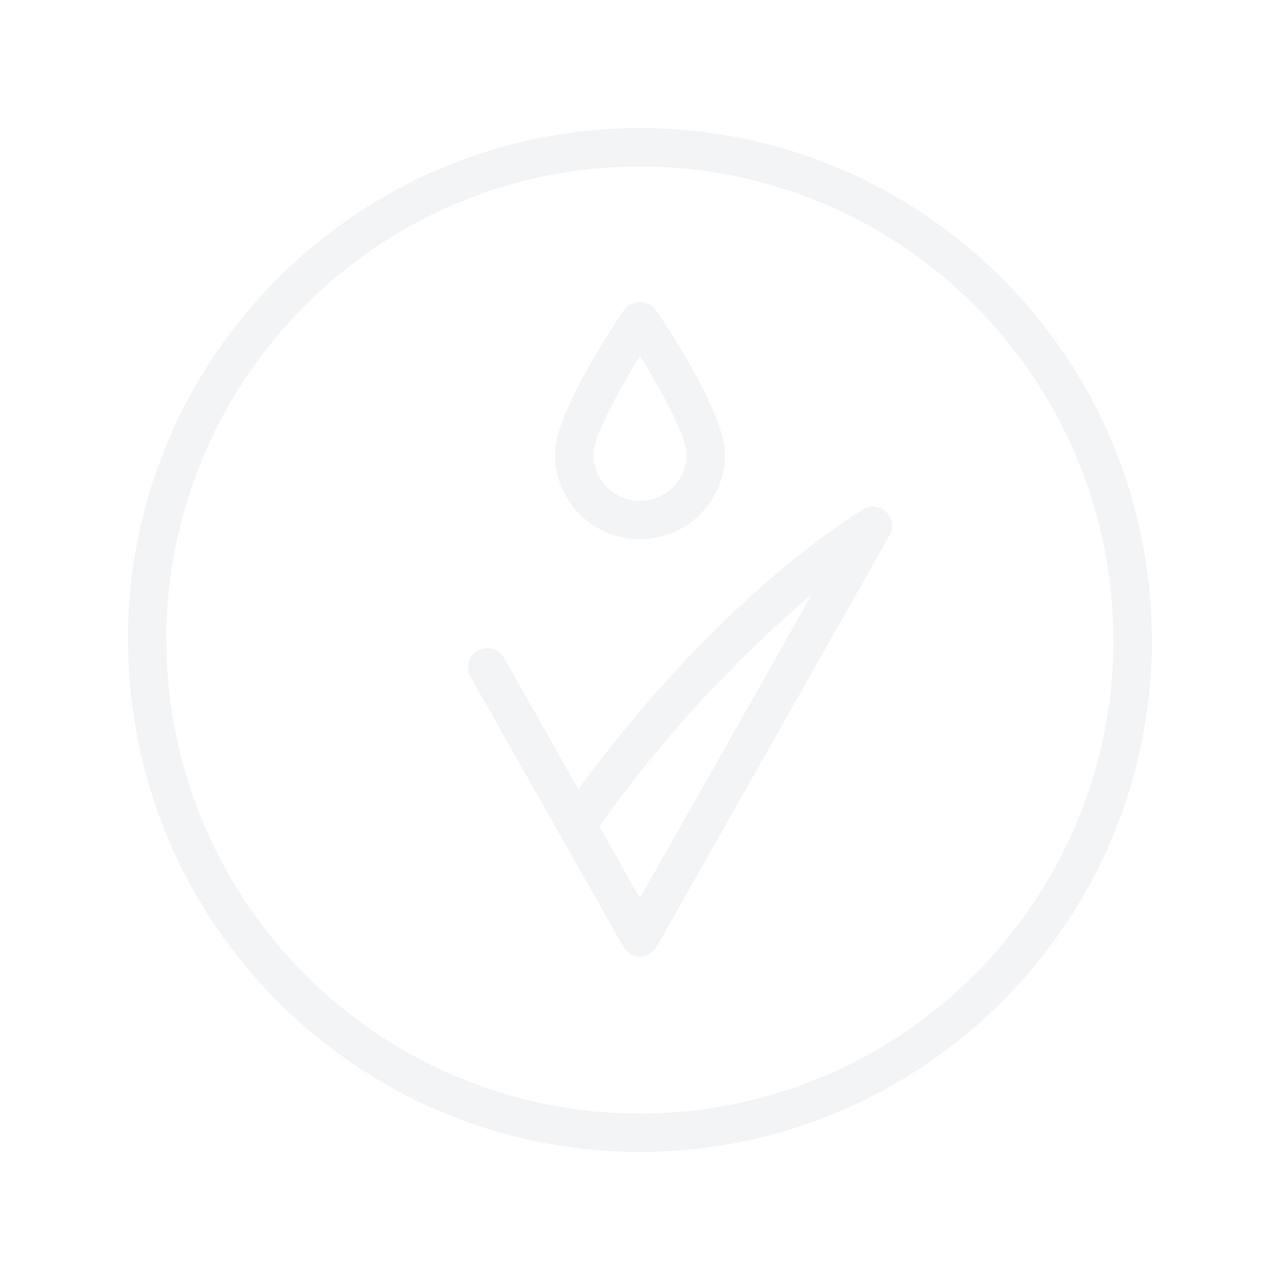 BIOTHERM Blue Therapy Eye Opening Serum 16.5ml